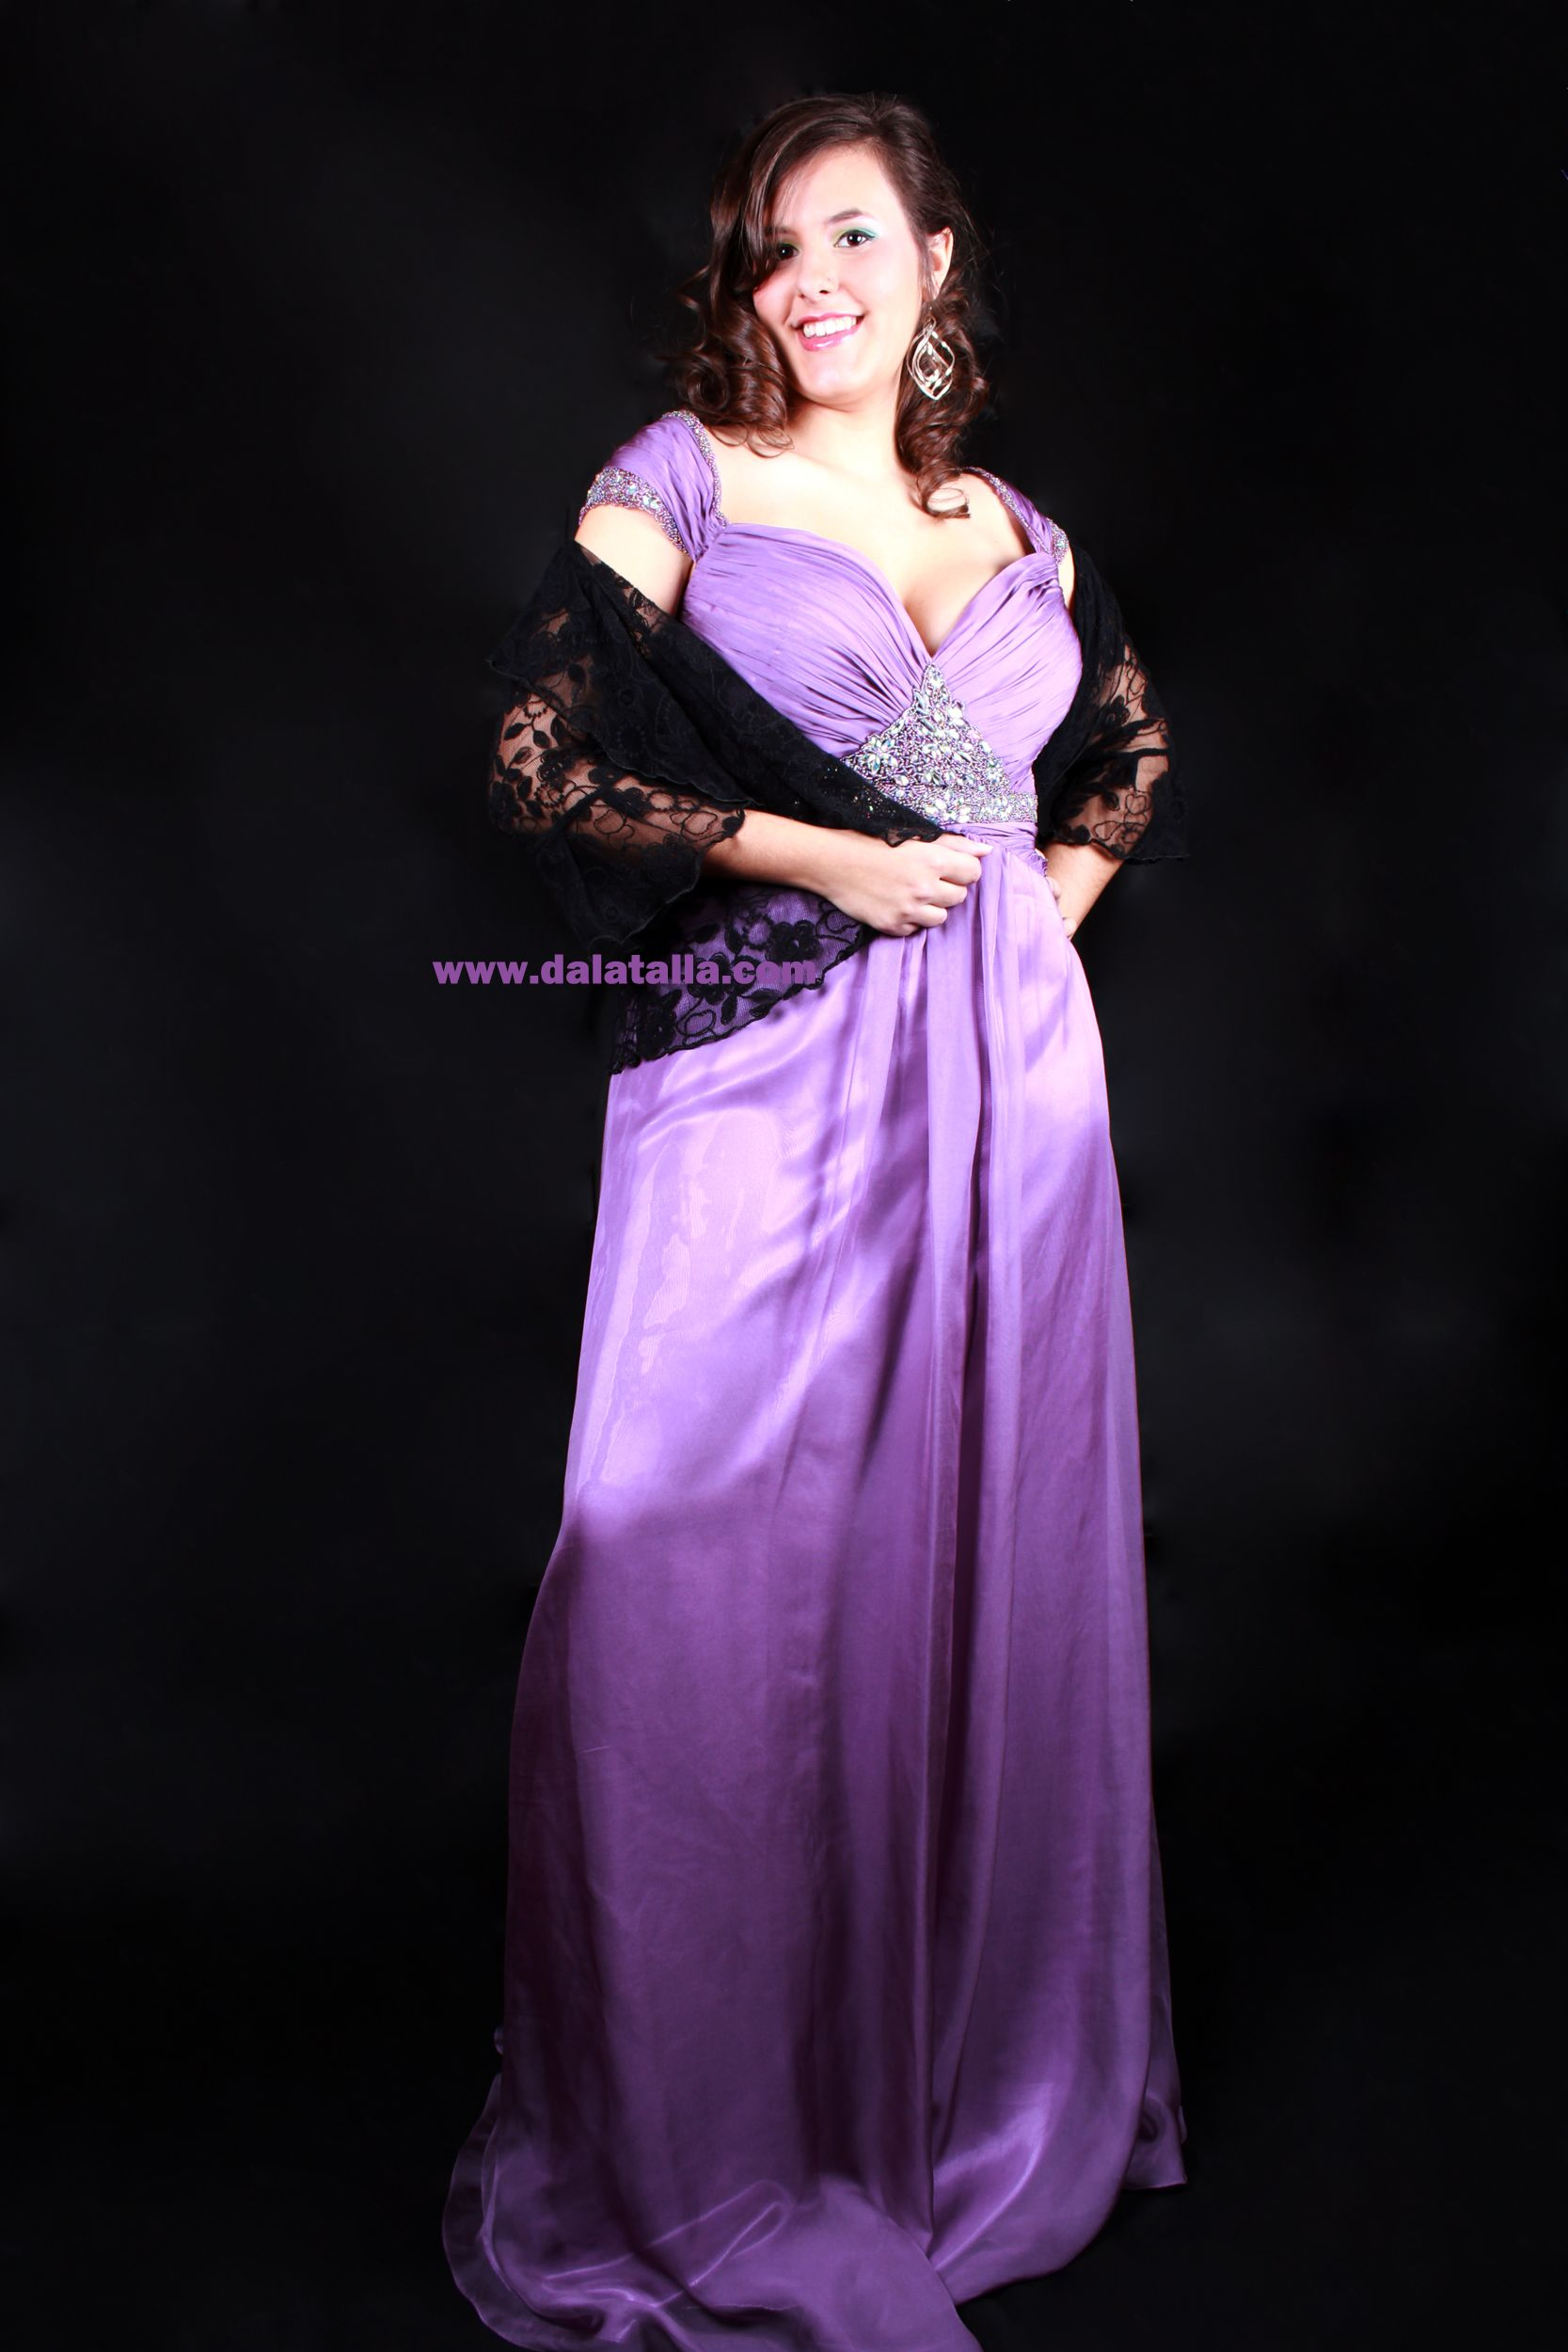 Vestido de fiesta talla grande | Clothes | Pinterest | Tallas ...